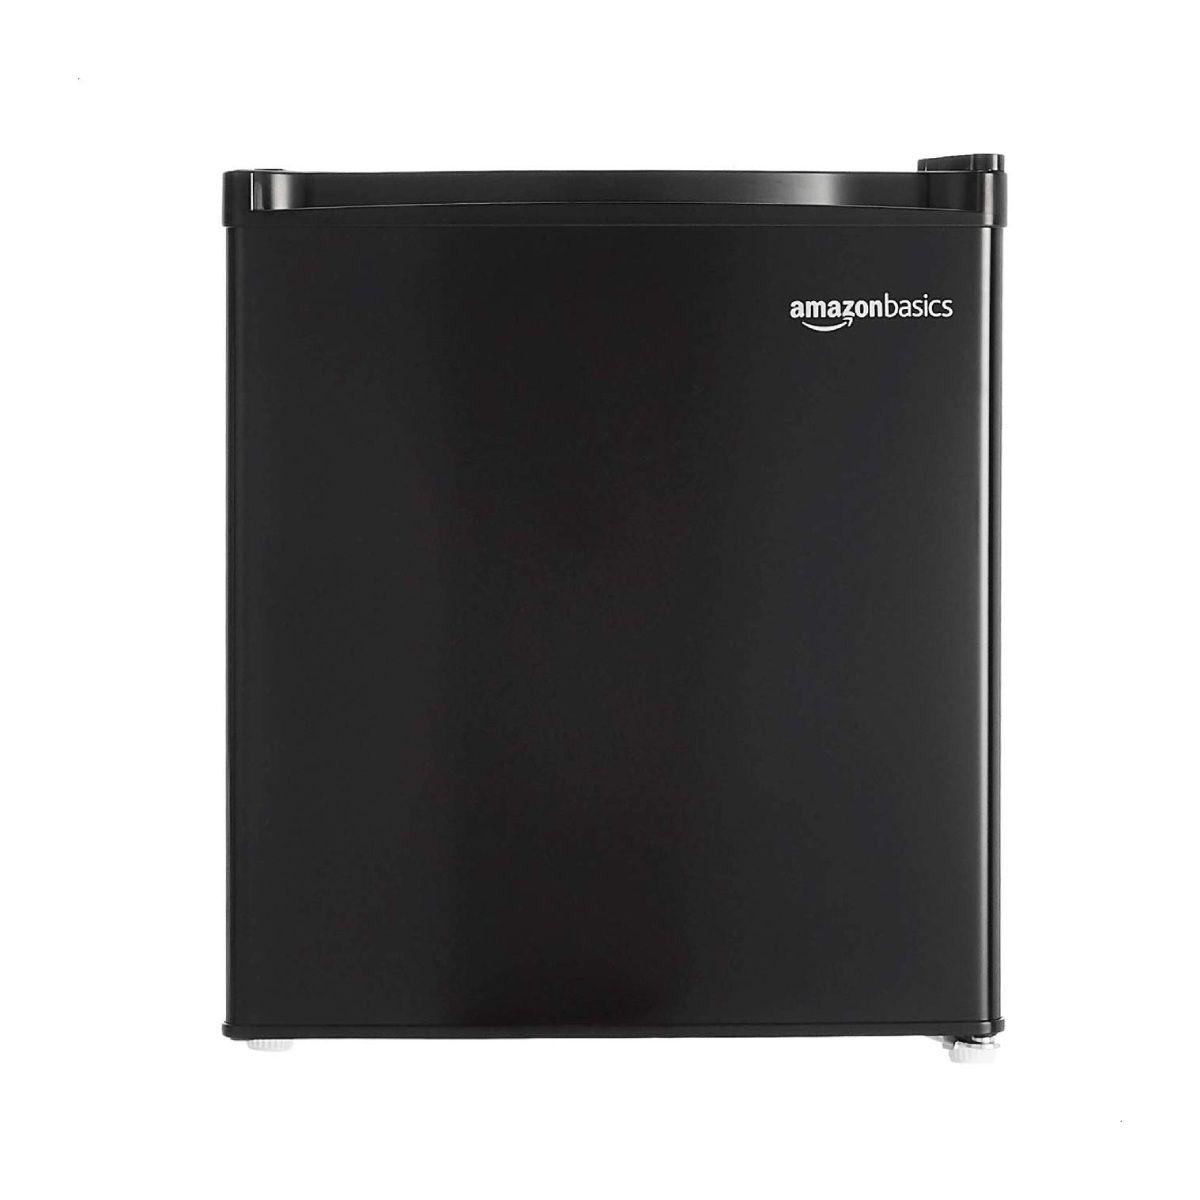 AmazonBasics 43 L Single Door Mini रेफ़्रिजरेटर